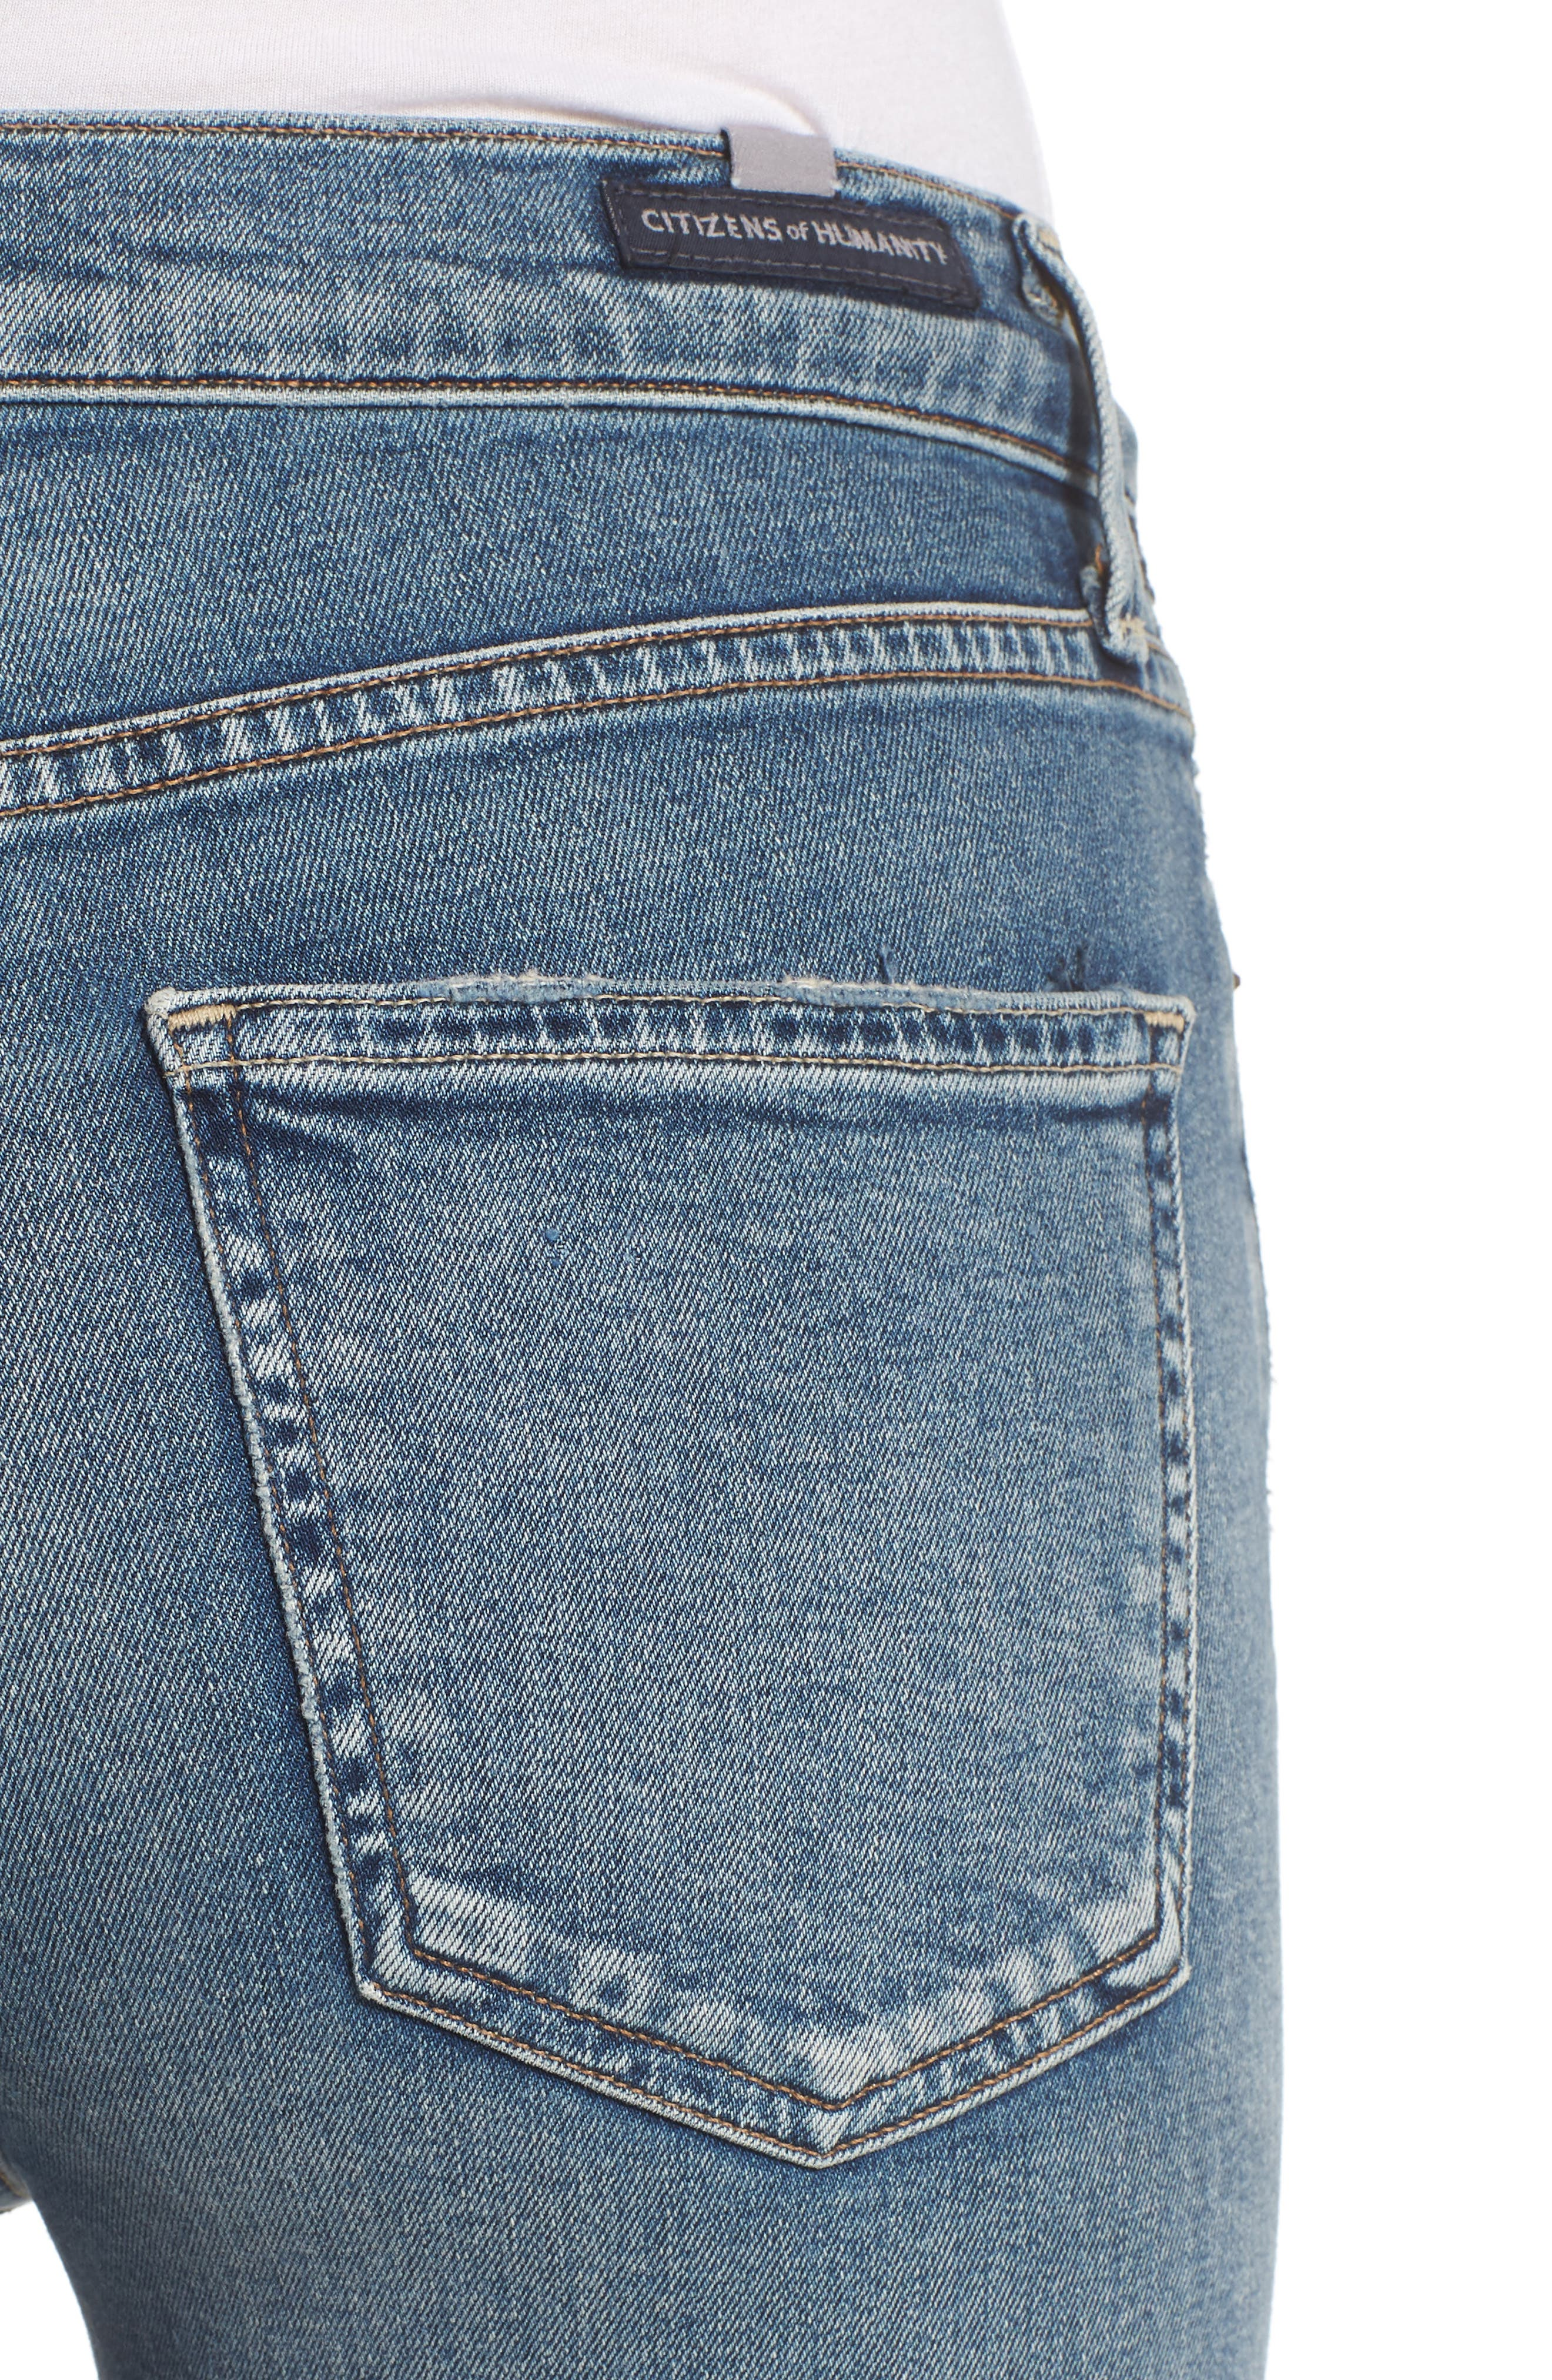 Rocket High Waist Crop Skinny Jeans,                             Alternate thumbnail 4, color,                             427